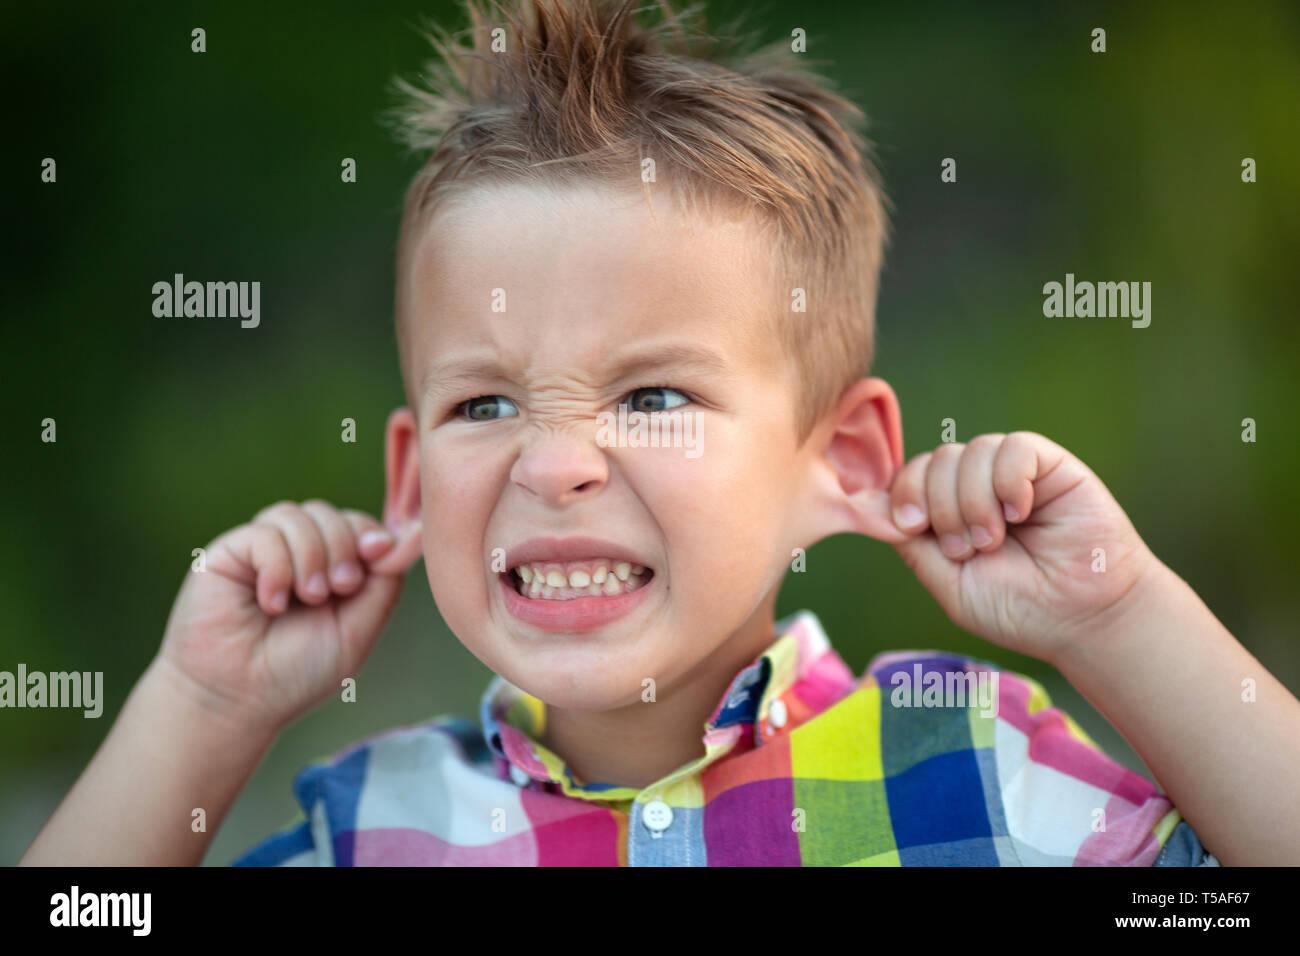 A grimacing kid - Stock Image